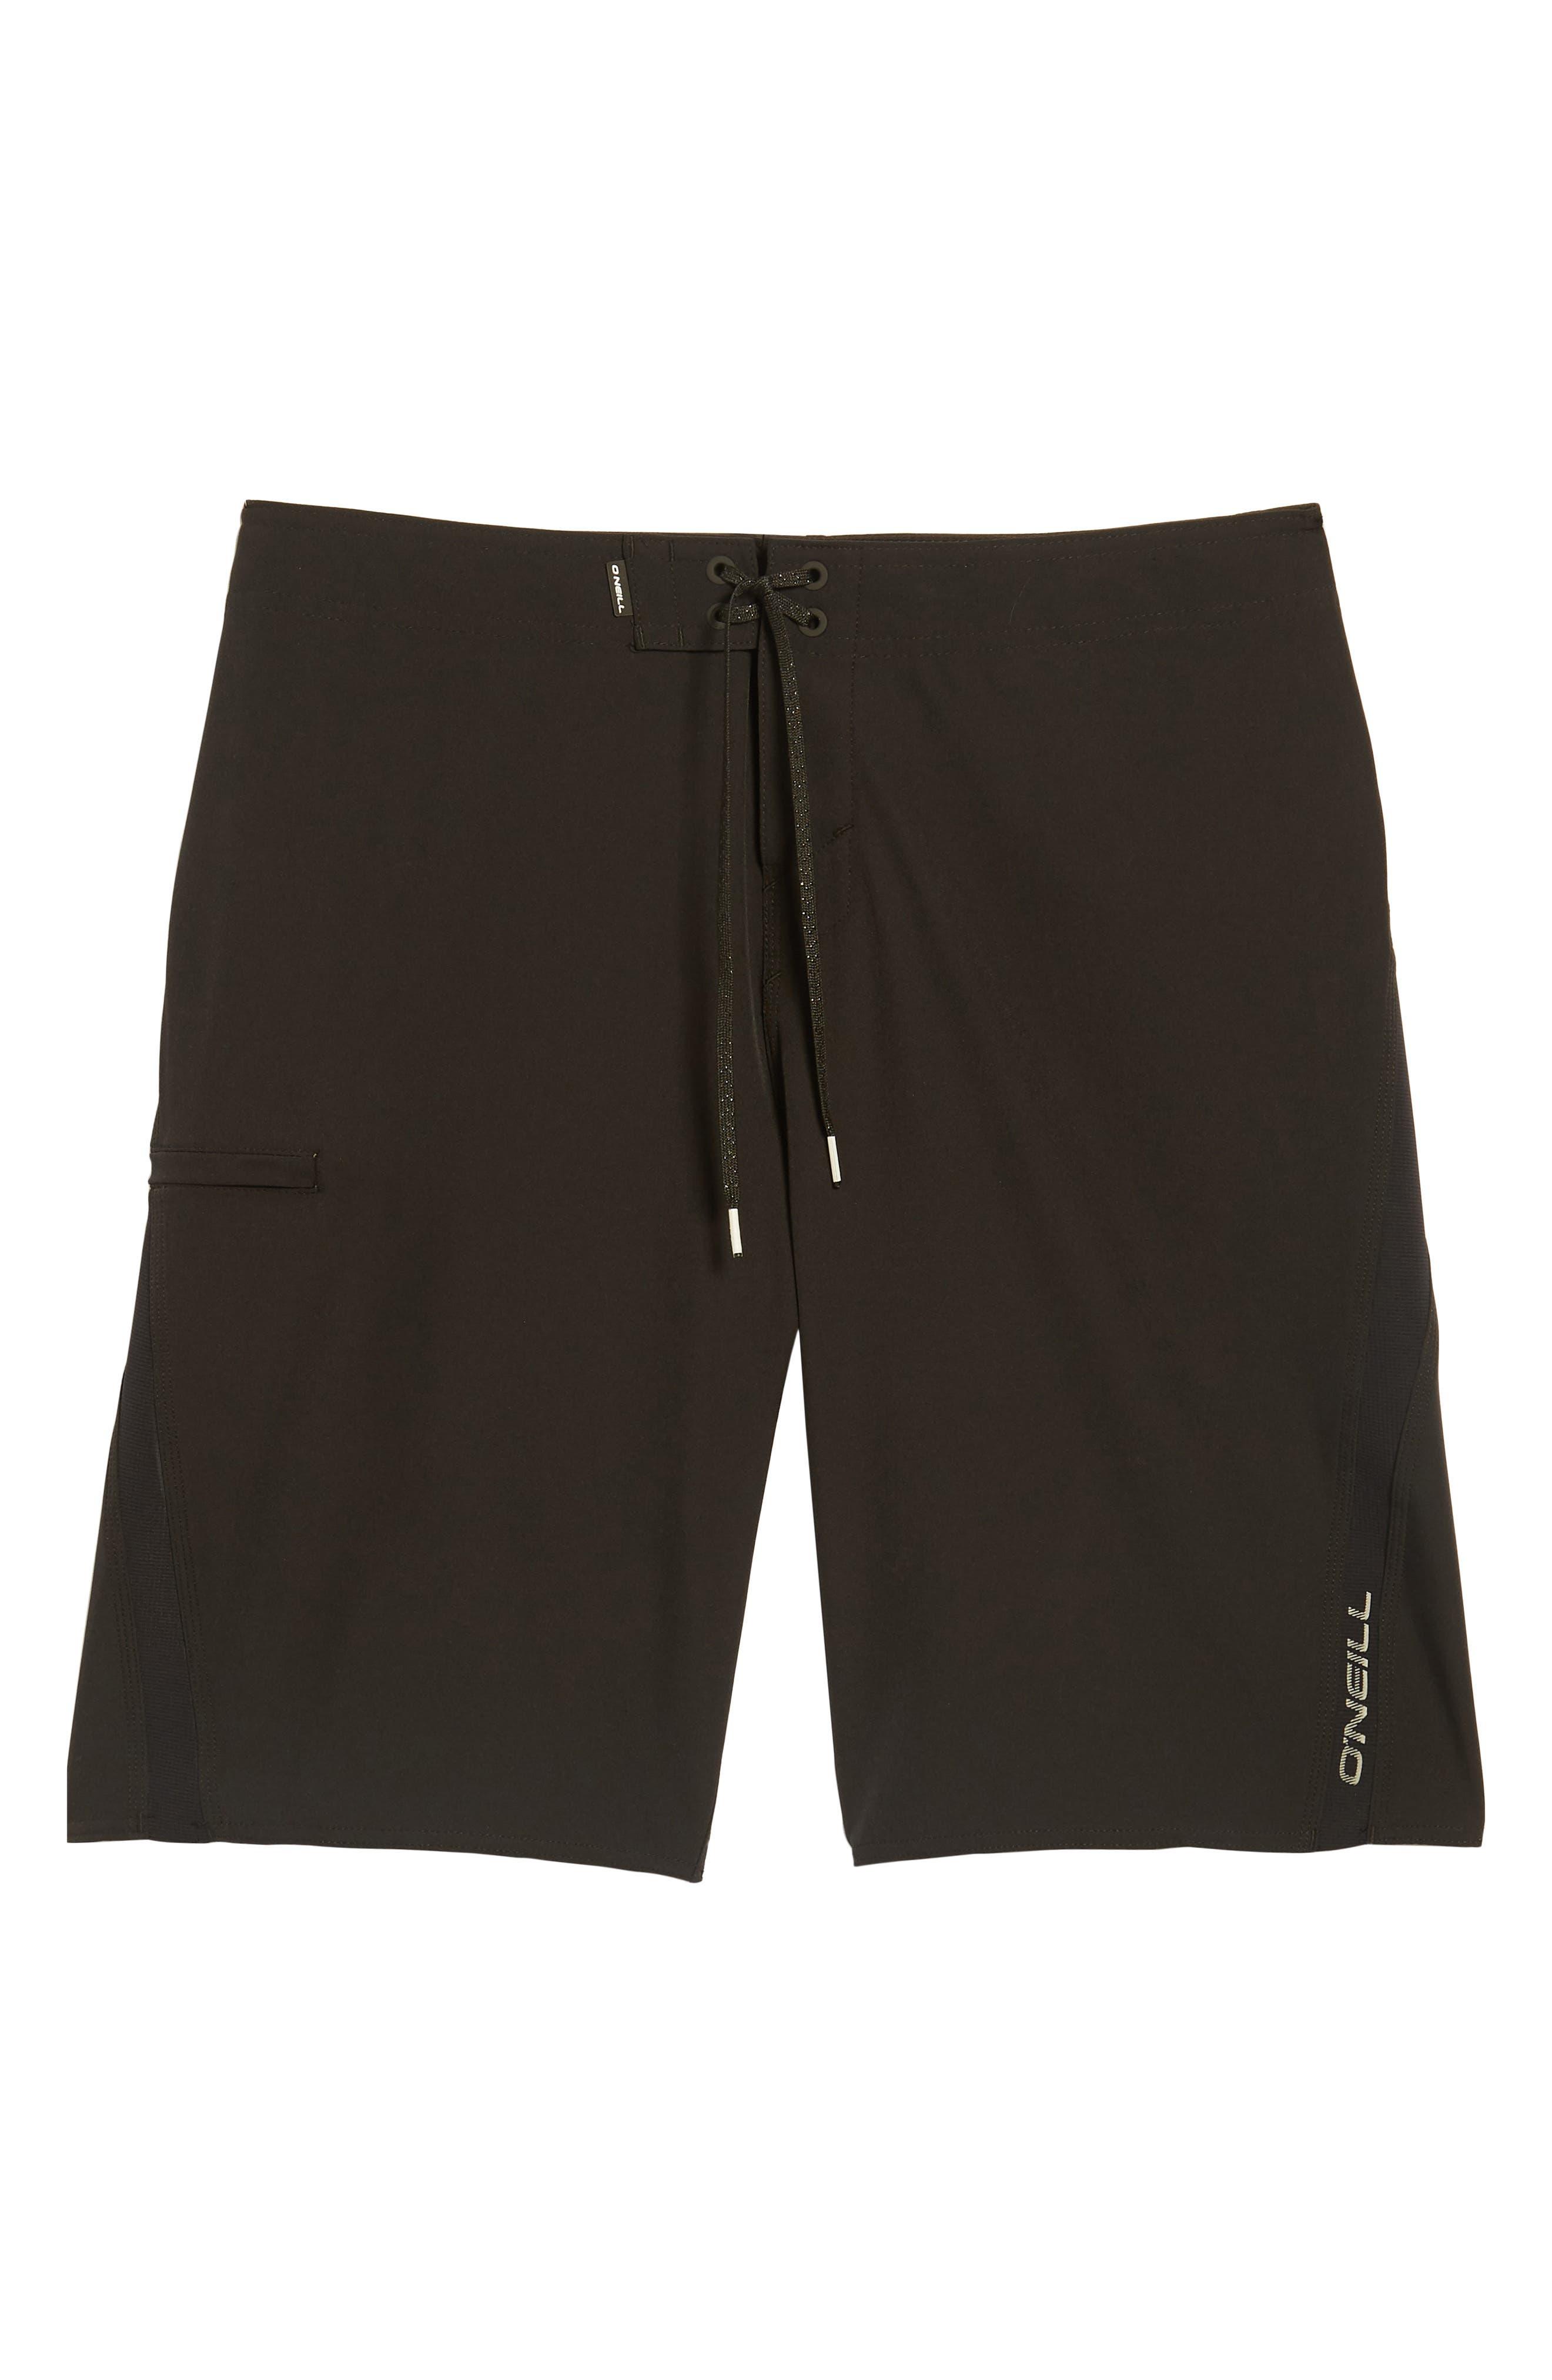 Superfreak Board Shorts,                             Alternate thumbnail 6, color,                             001